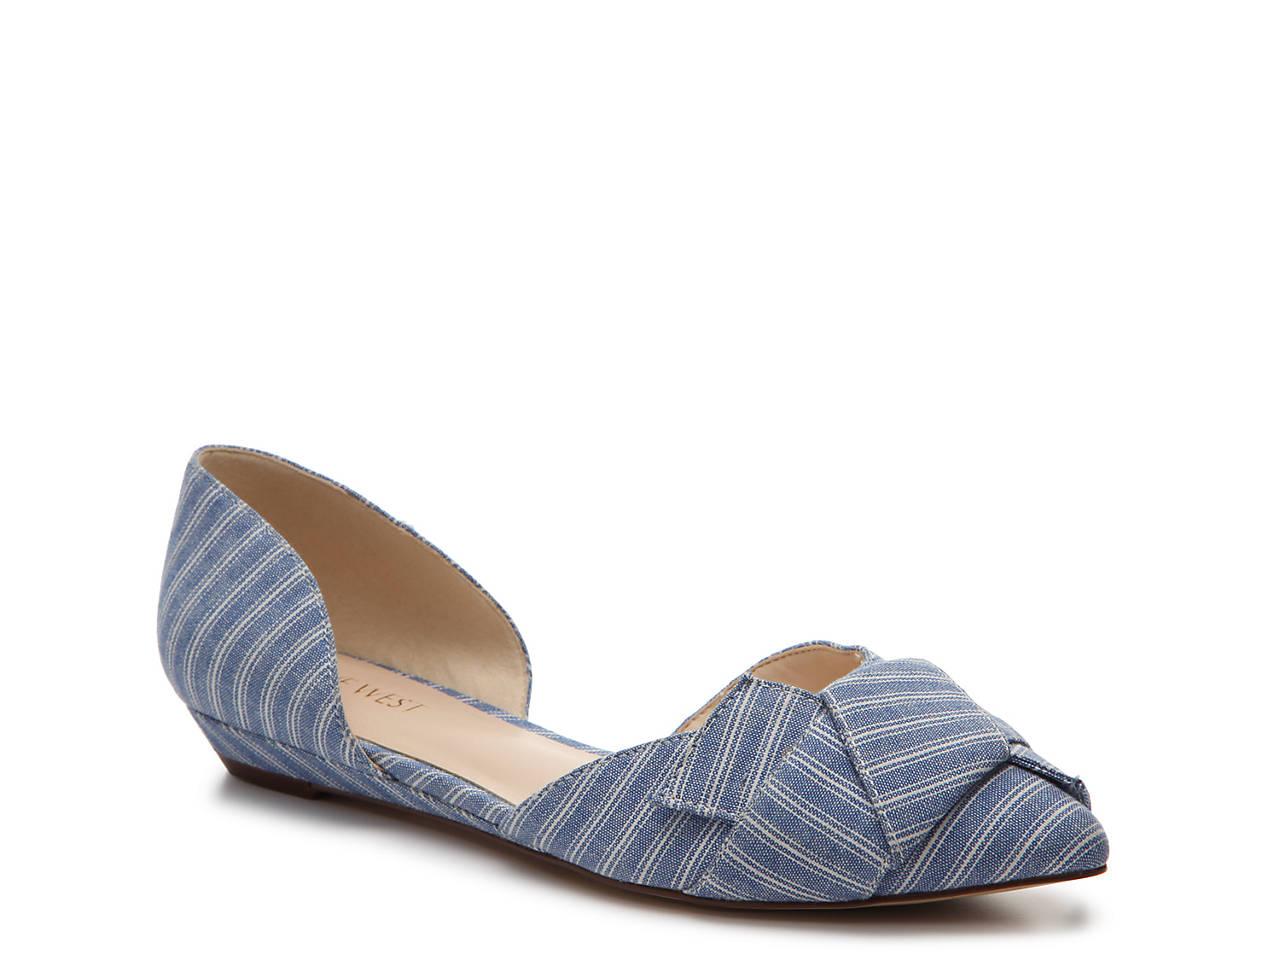 7edfc80322a Nine West Solevieve Oragami Flat Women s Shoes